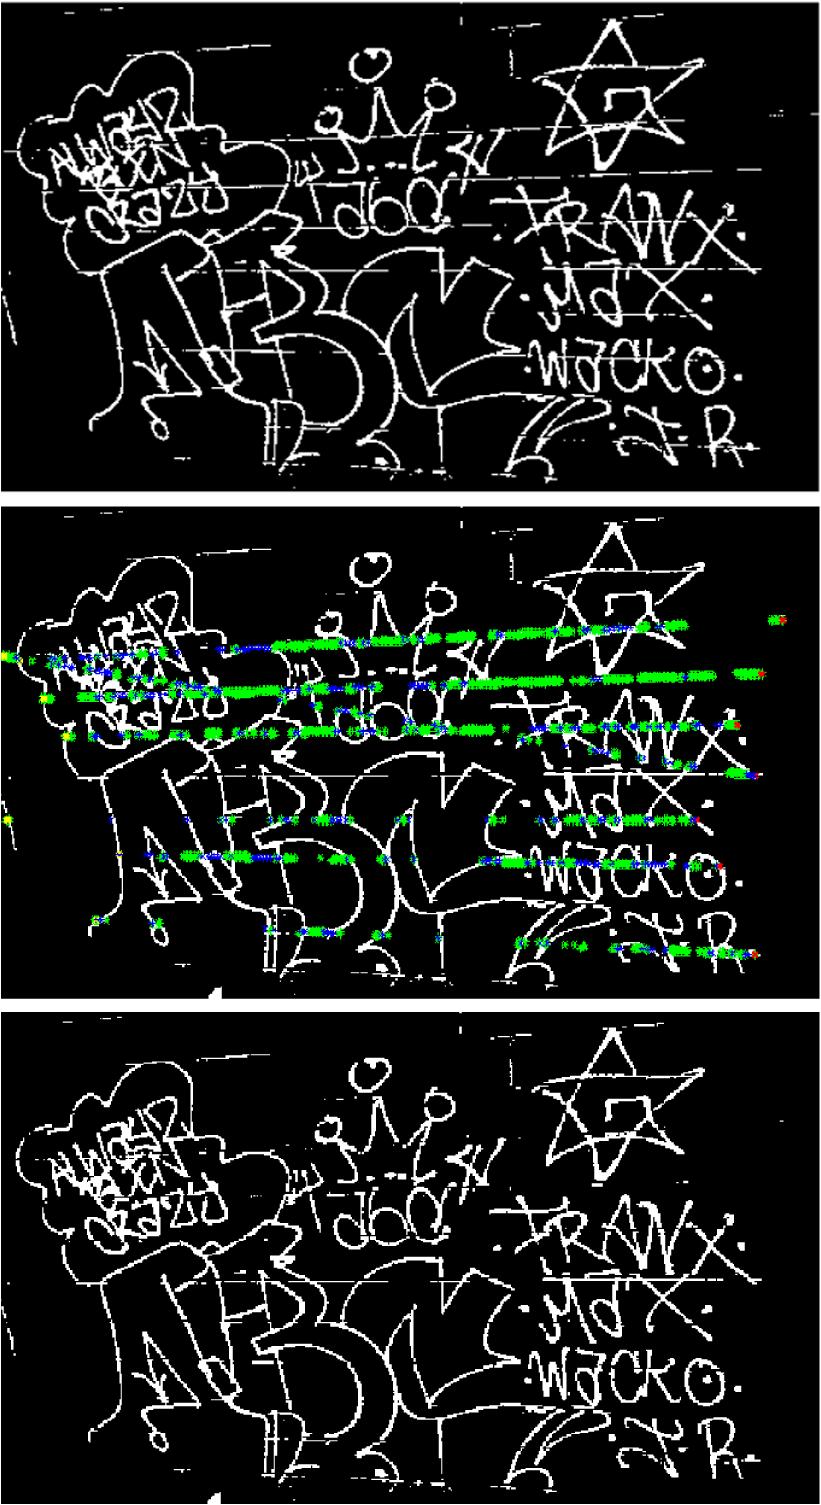 Automatic gang graffiti recognition and interpretation